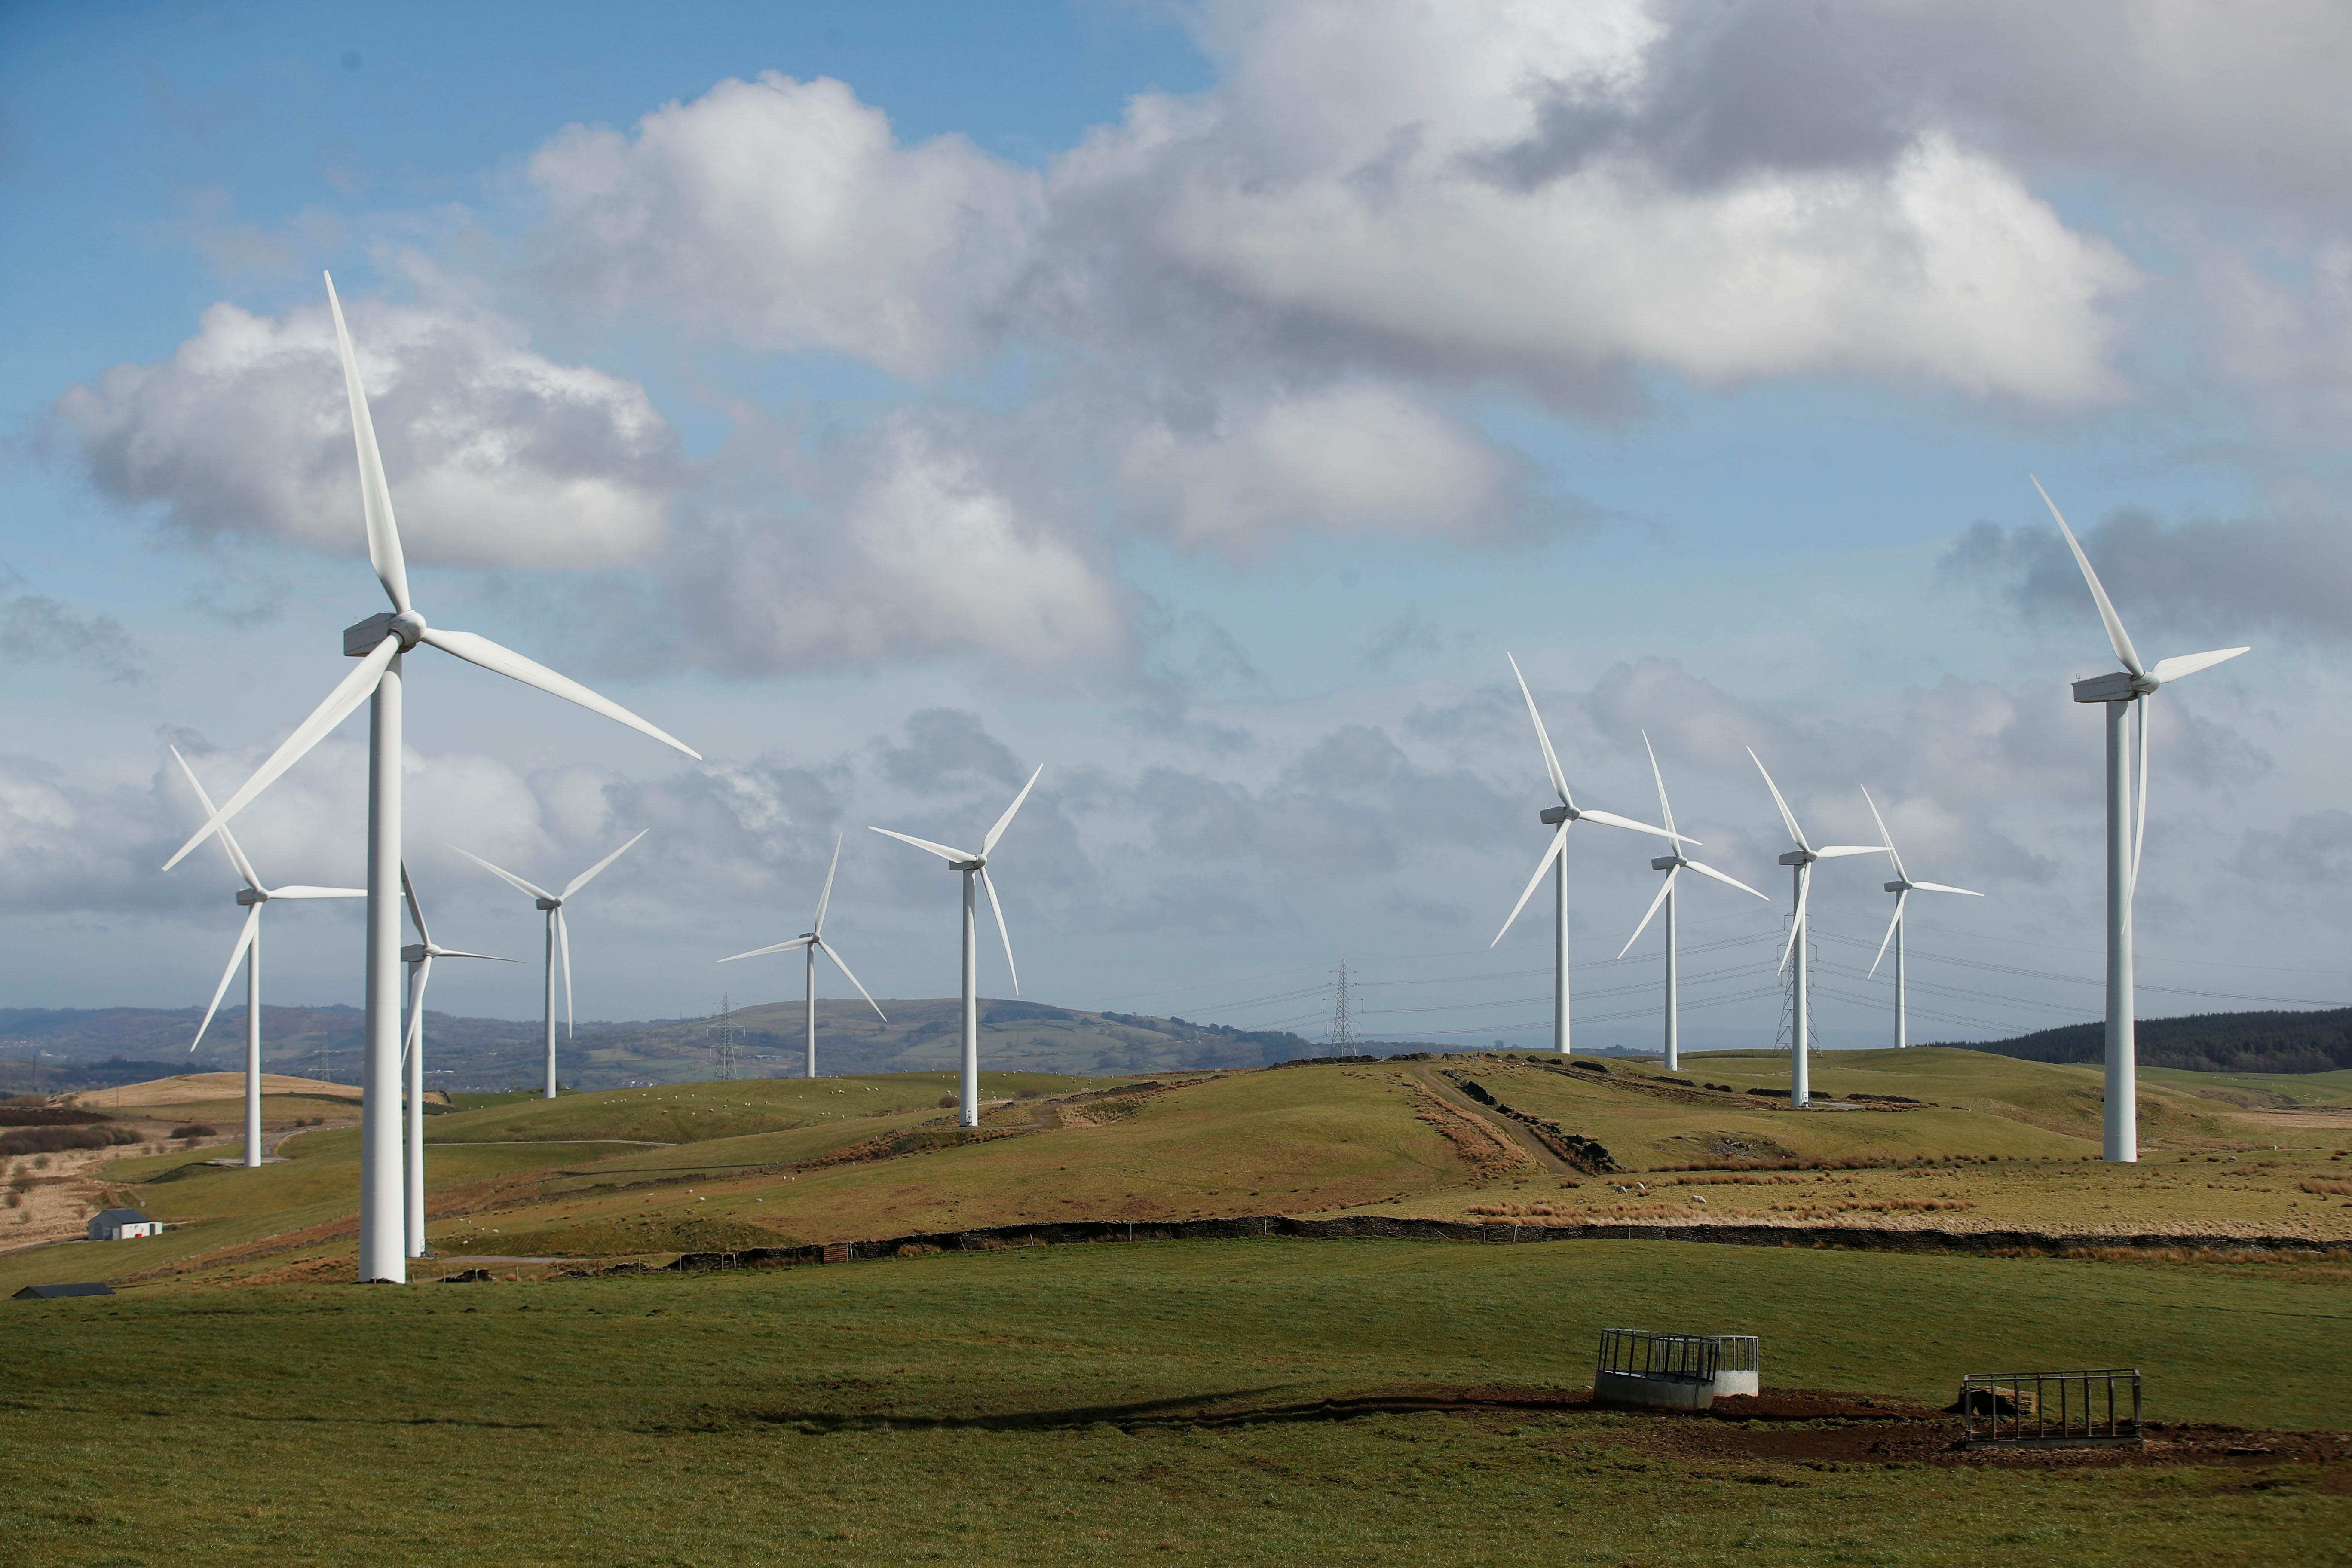 Wind turbines are seen at Mynydd Portref Wind Farm near Hendreforgan in South Wales, Britain, March 26, 2021. REUTERS/Matthew Childs